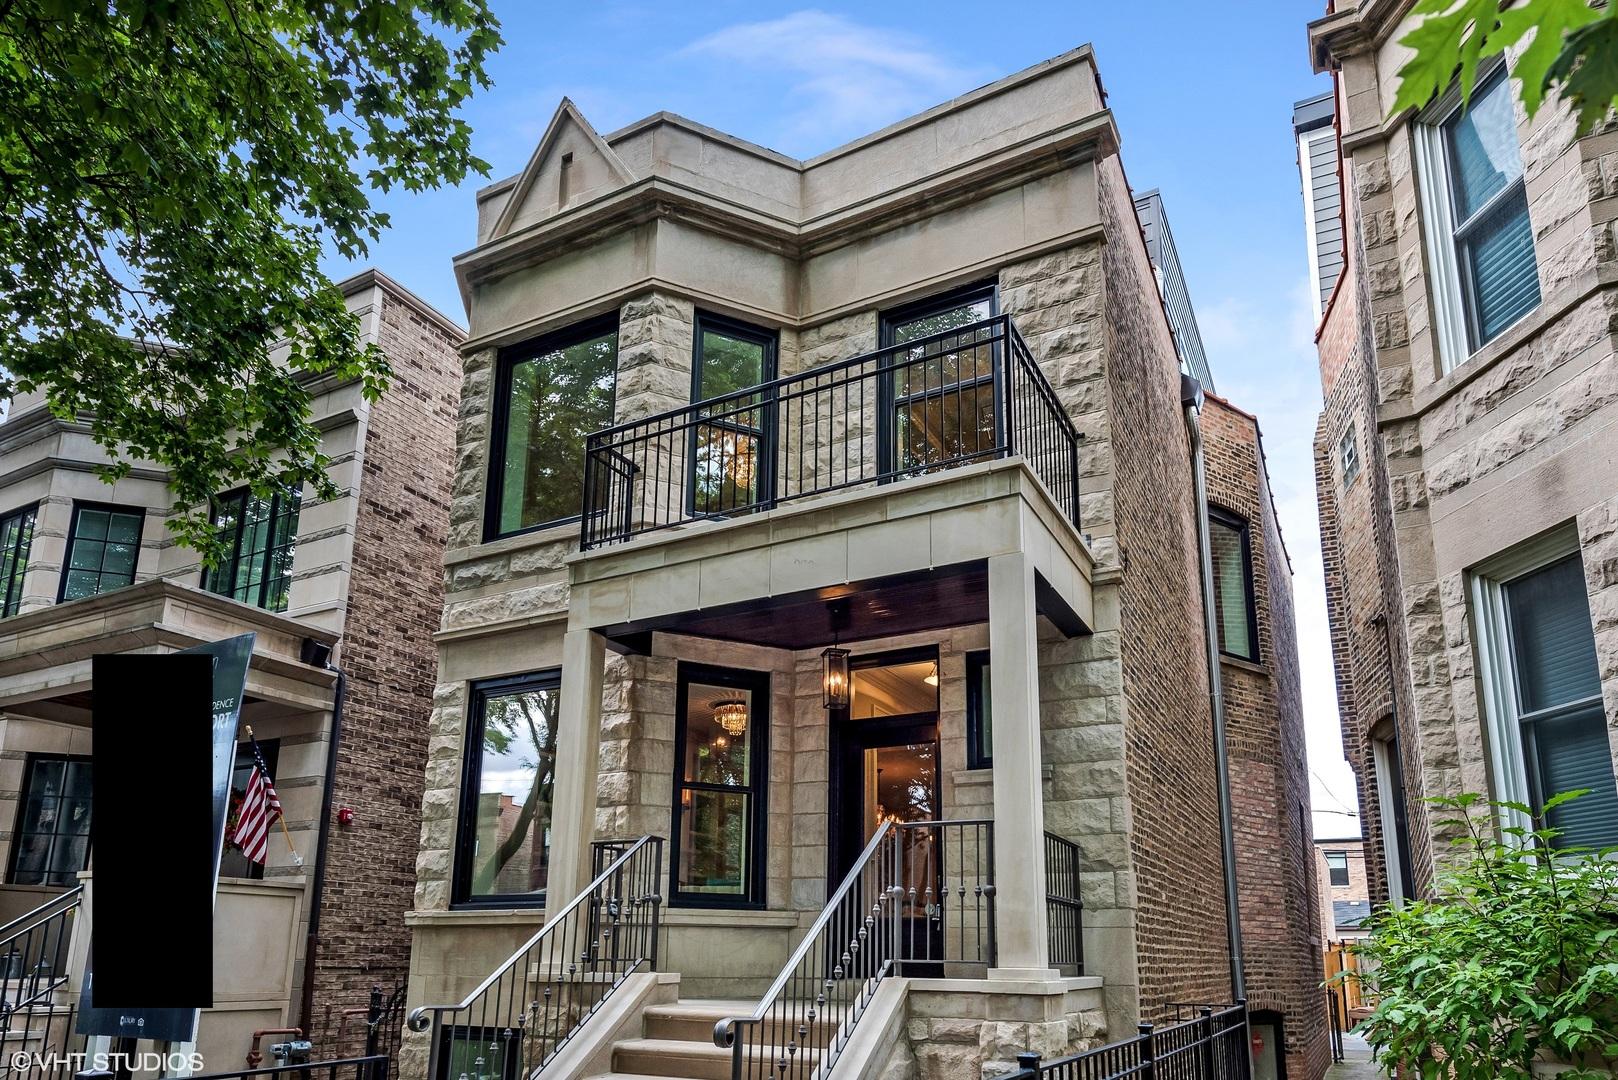 1330 West Newport Avenue, Chicago-Near West Side, Illinois